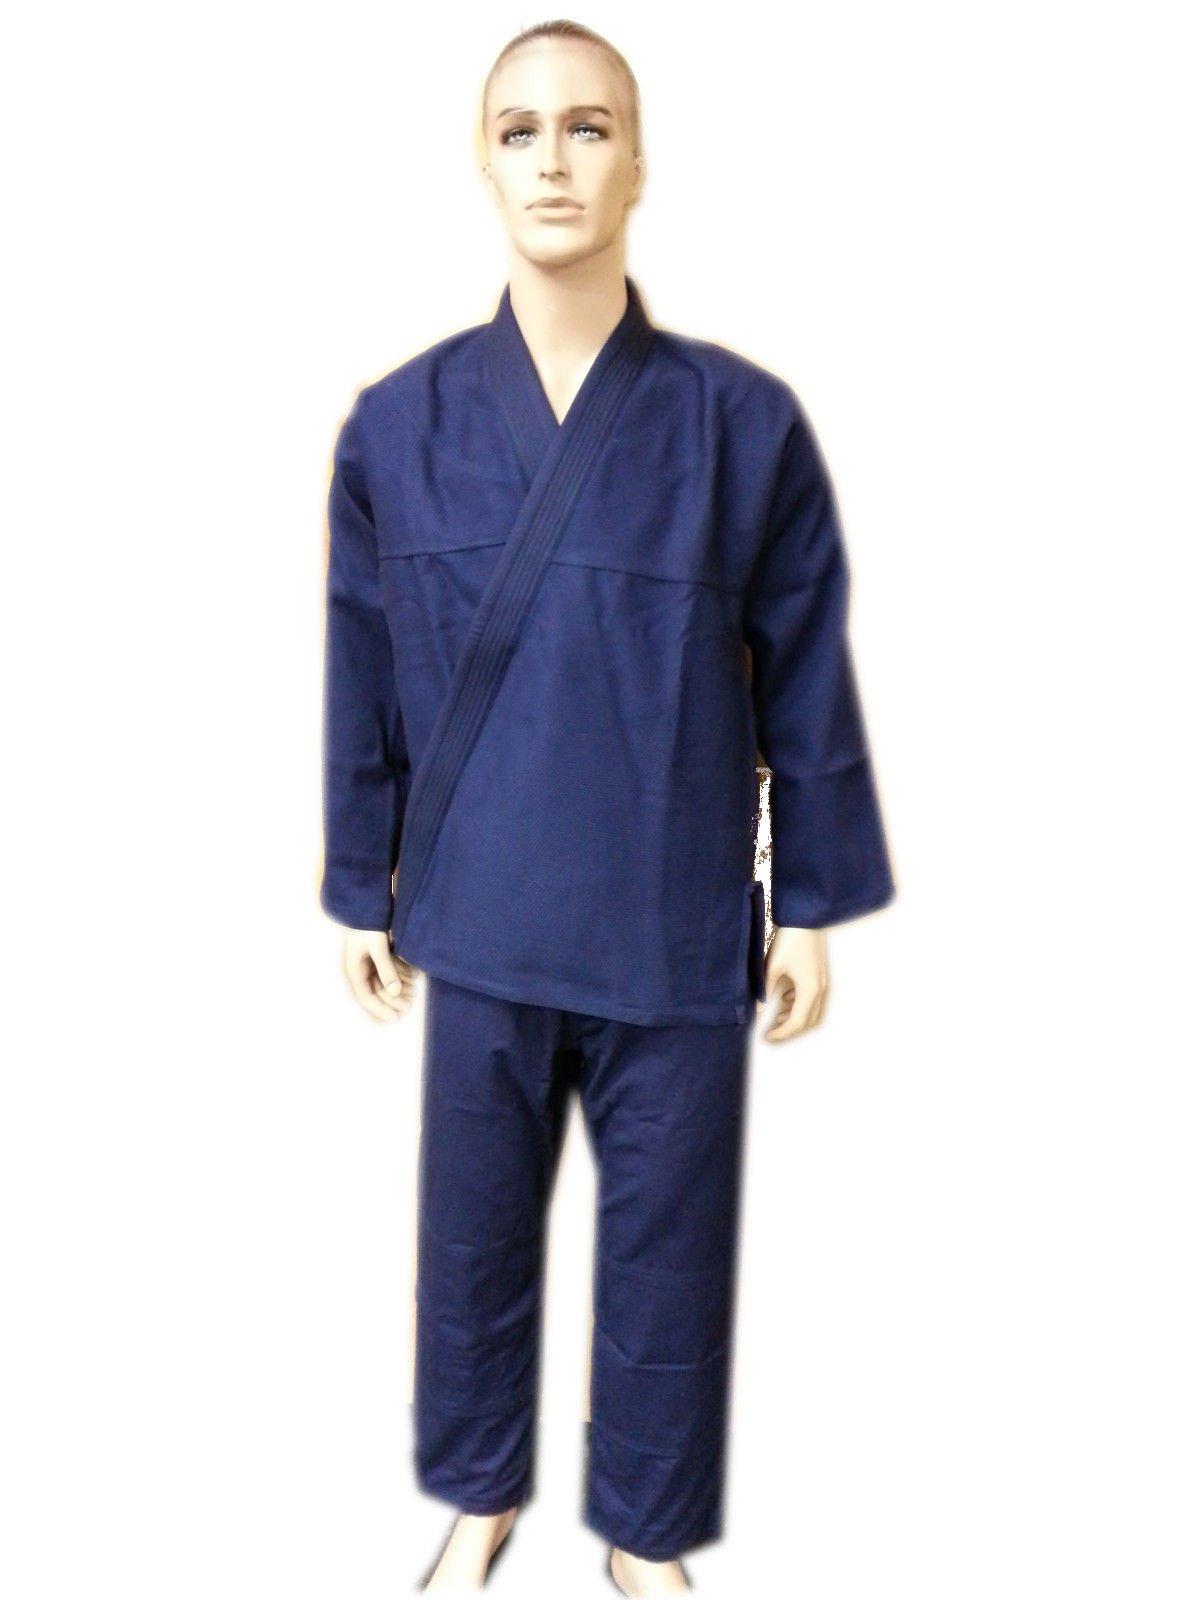 Woldorf USA Brazilian jiu Jitsu Kimono Pearl Weave Gi Competition Uniform Navy Blue with Ripstop Pant A3 NO Logo by Woldorf USA